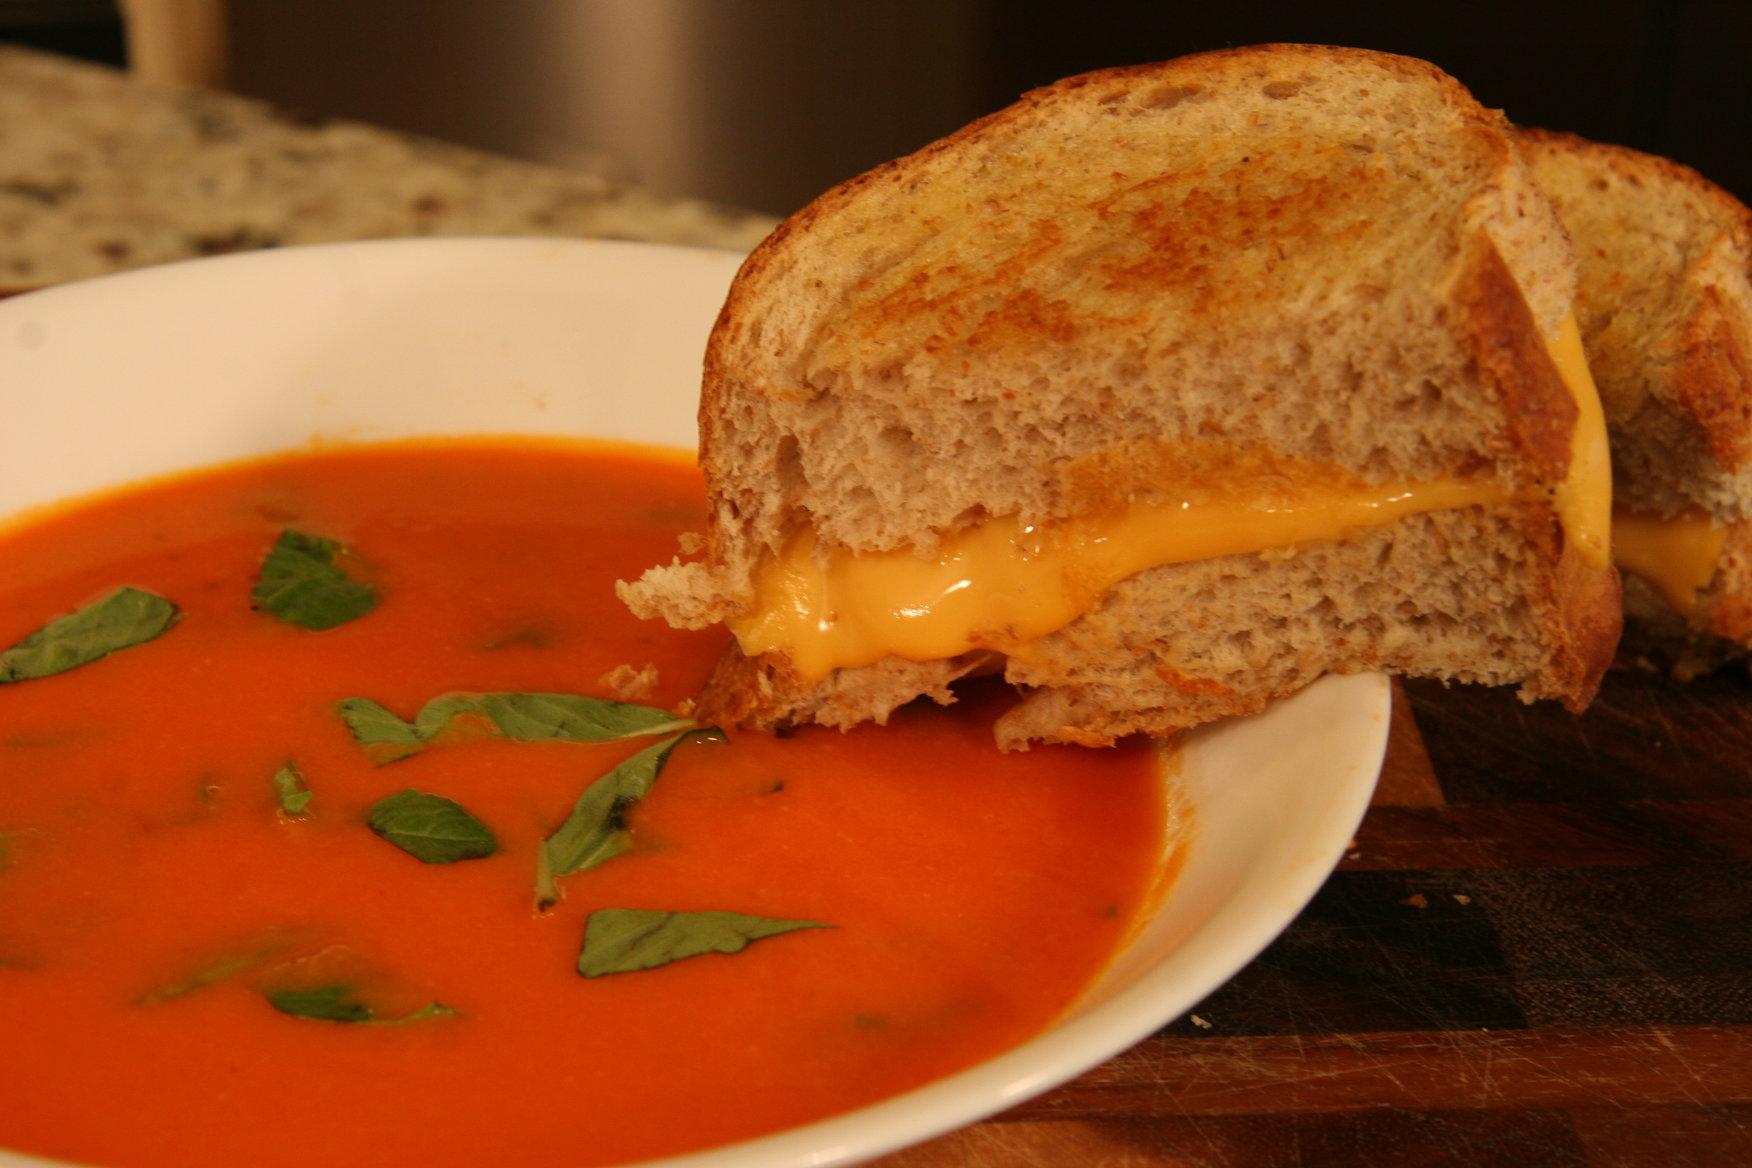 rsz_tomato-soup-and-gc